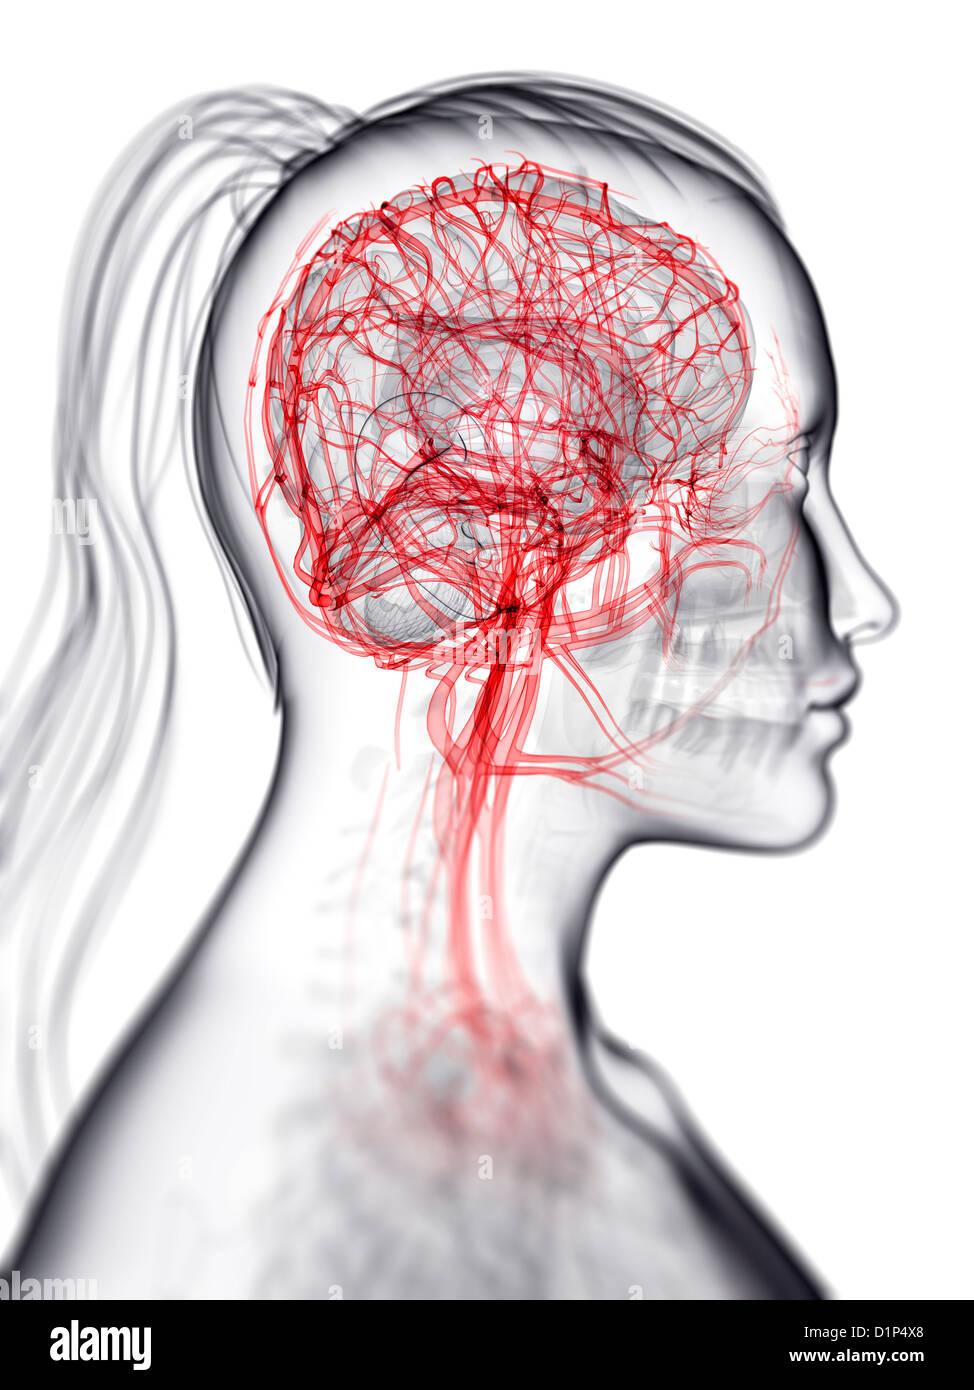 Brain's blood supply, artwork - Stock Image